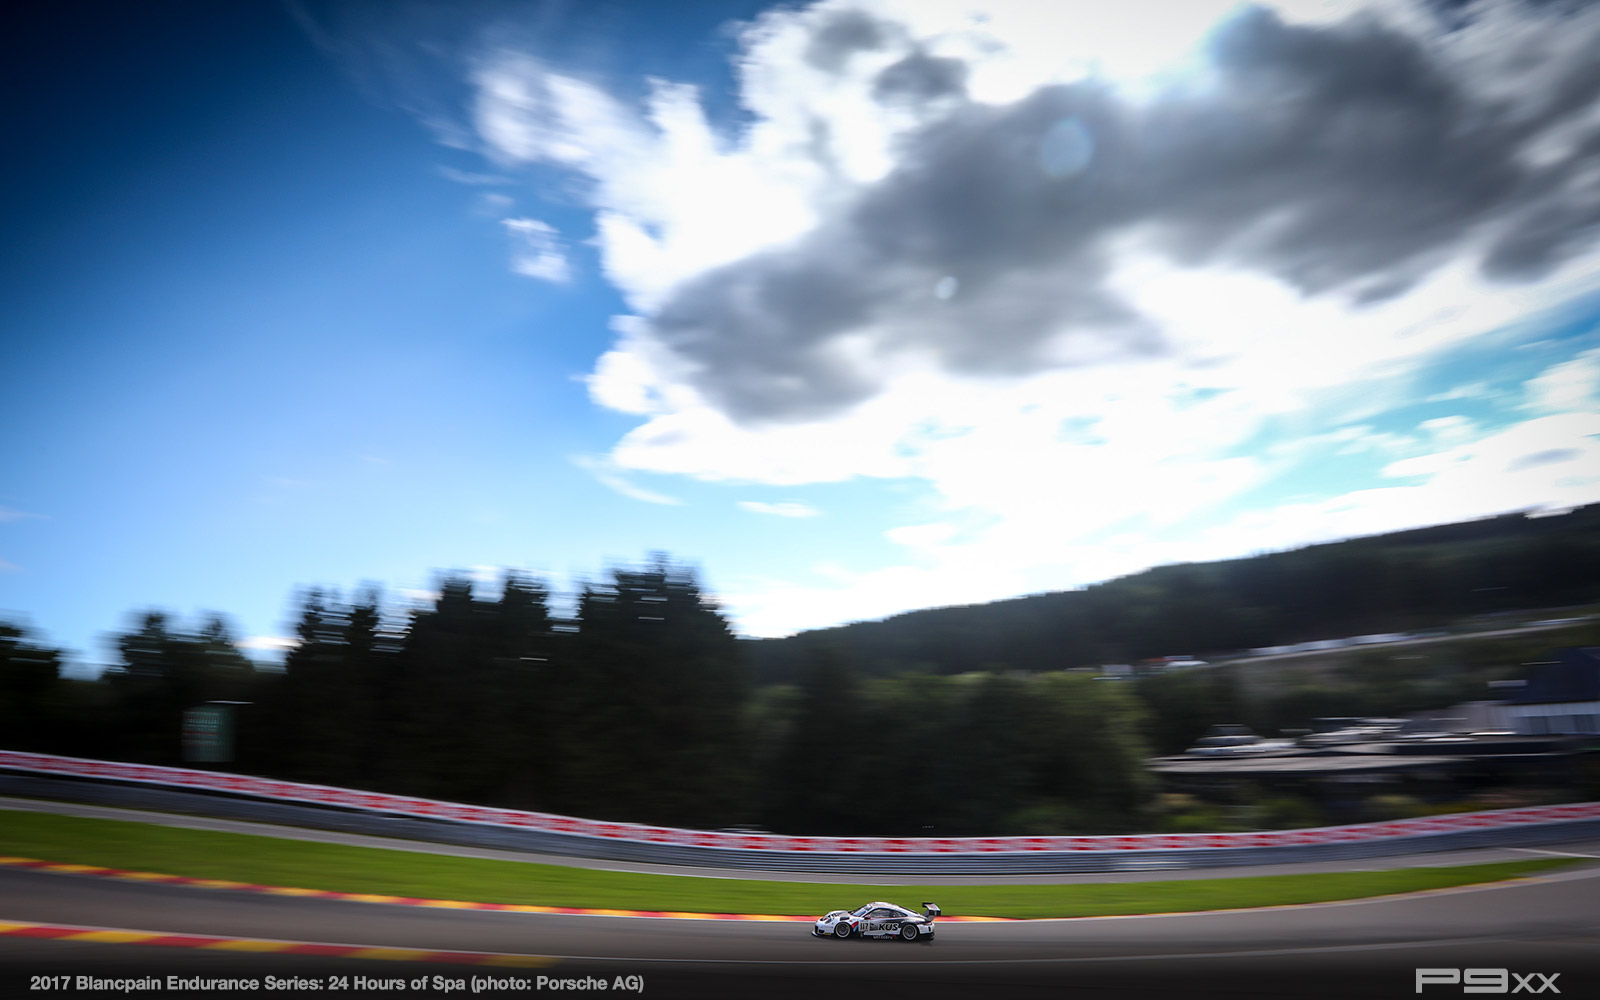 2017-24-Hours-of-Spa-Porsche-357